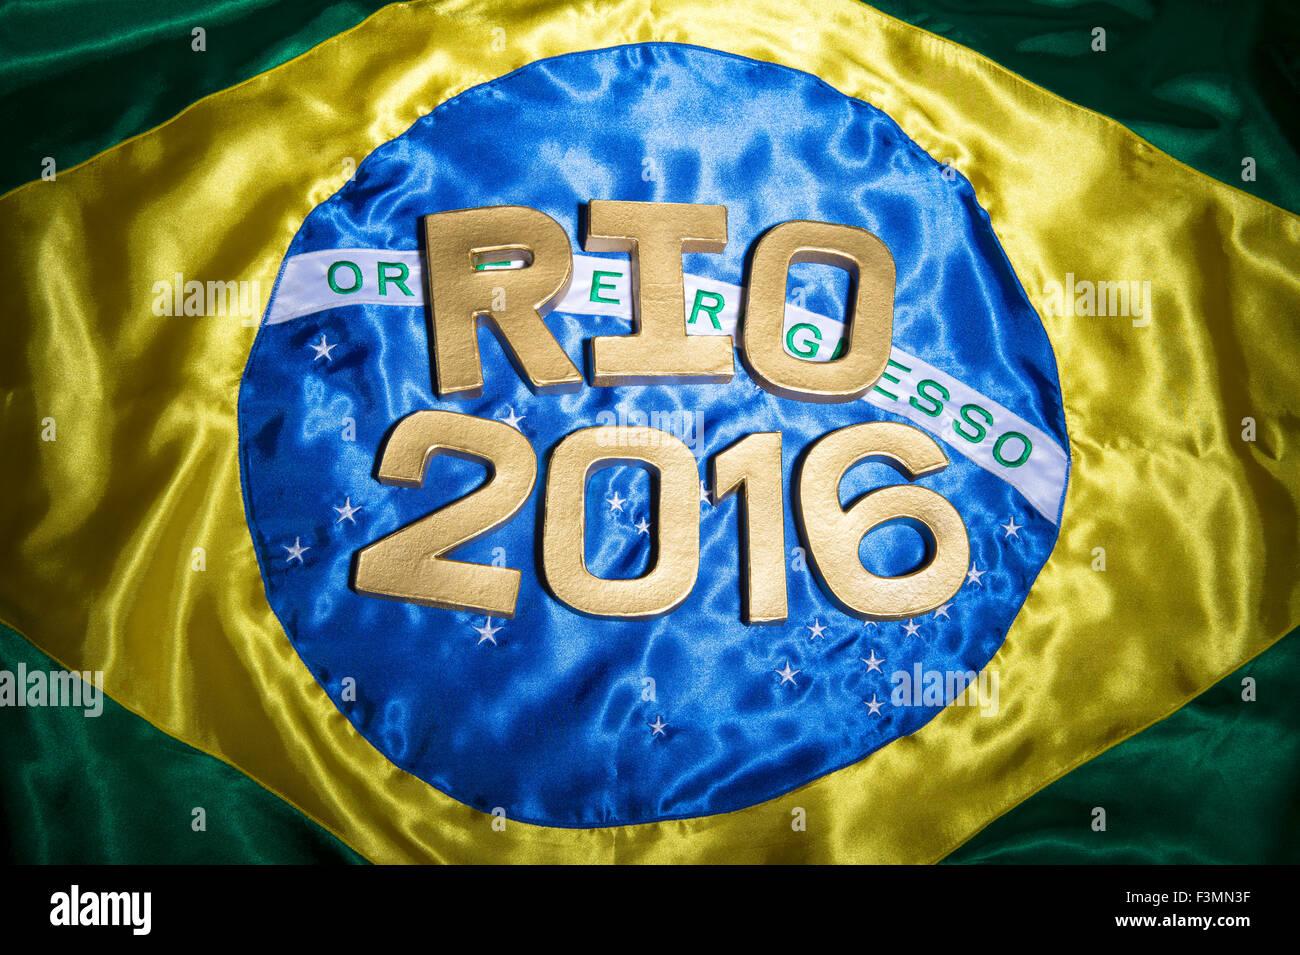 RIO DE JANEIRO, BRAZIL - FEBRUARY 3, 2015: Rio 2016 message in gold letters sits across shiny Brazilian flag. - Stock Image